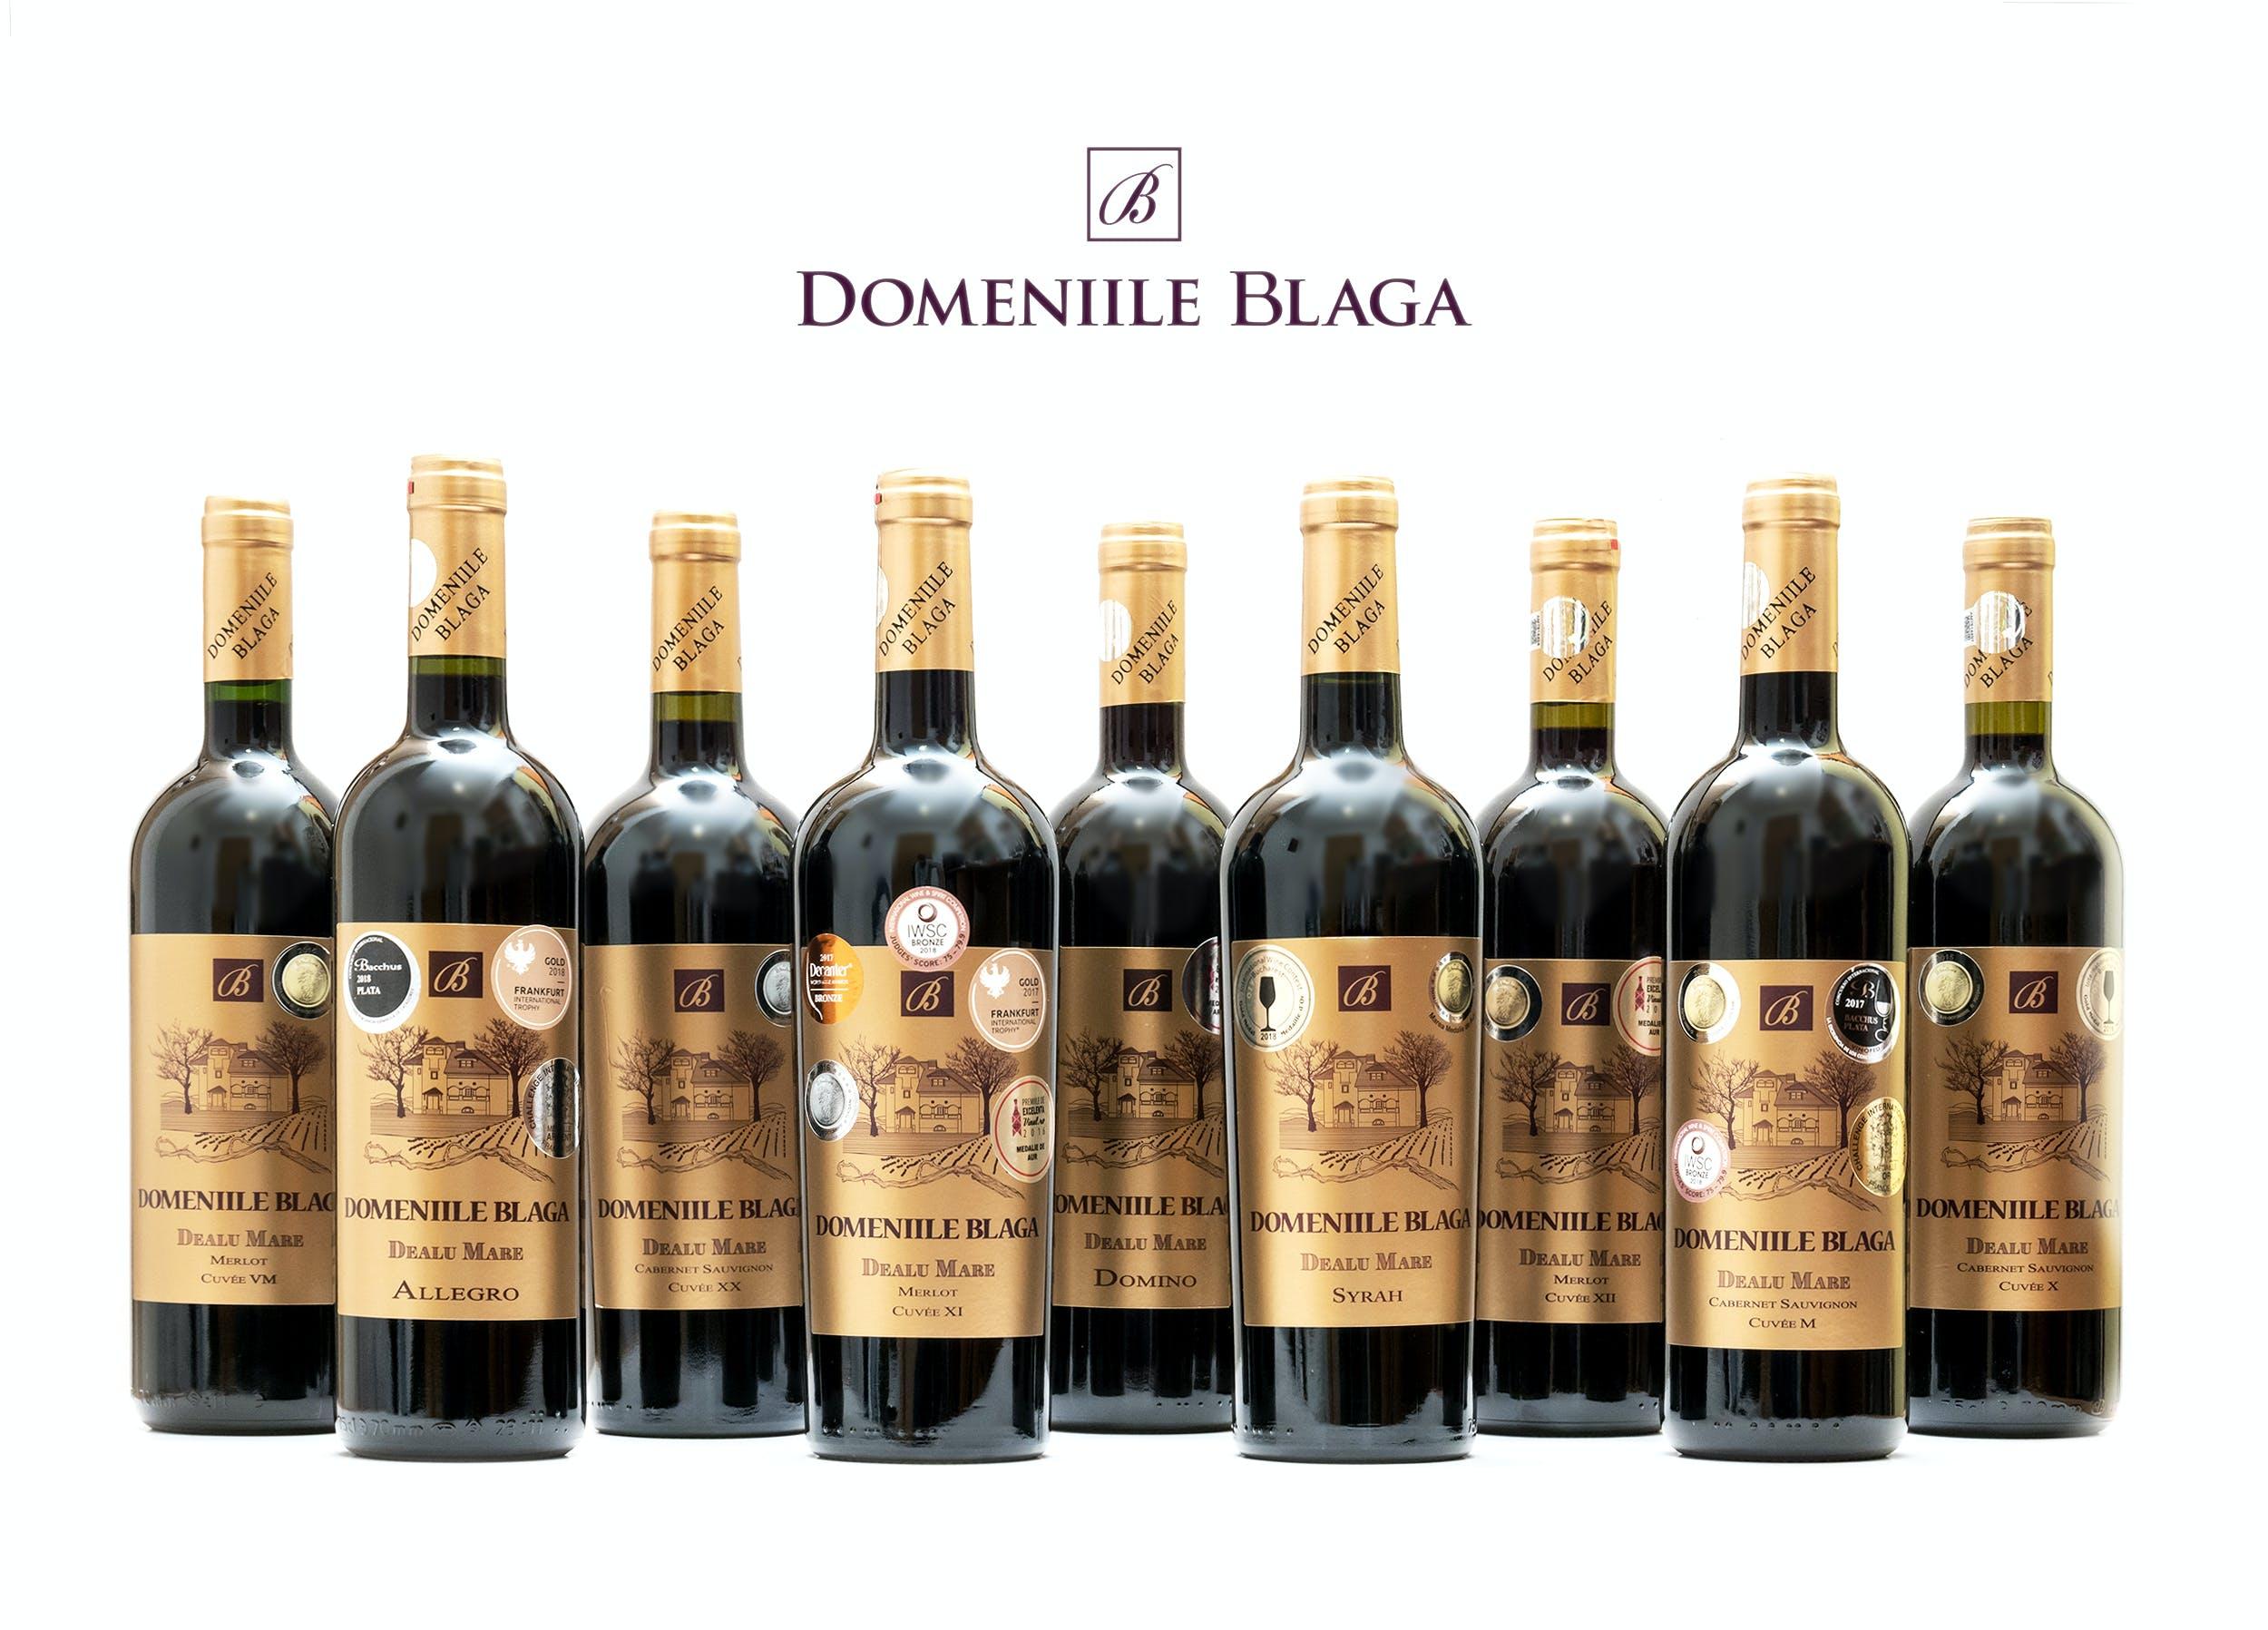 Free stock photo of blaga, bottle, Cabernet, dealu mare